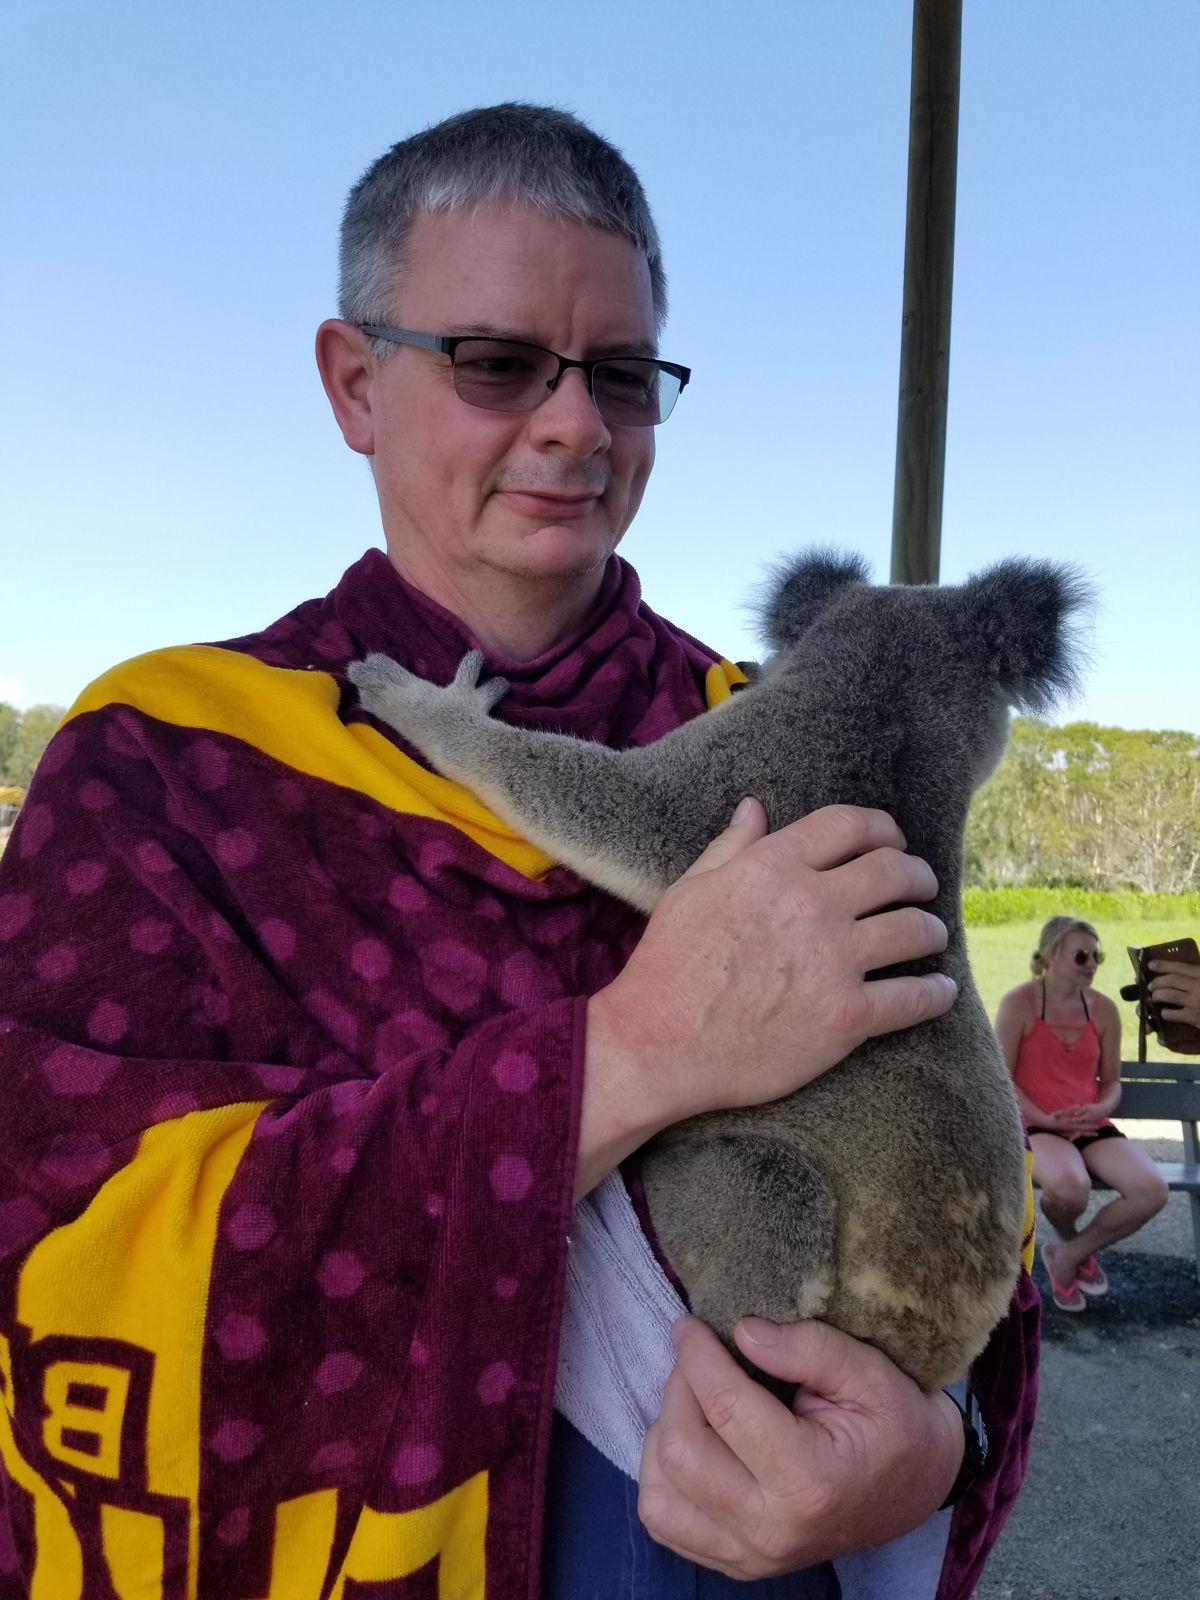 Haights take trip to Australia (Koala)